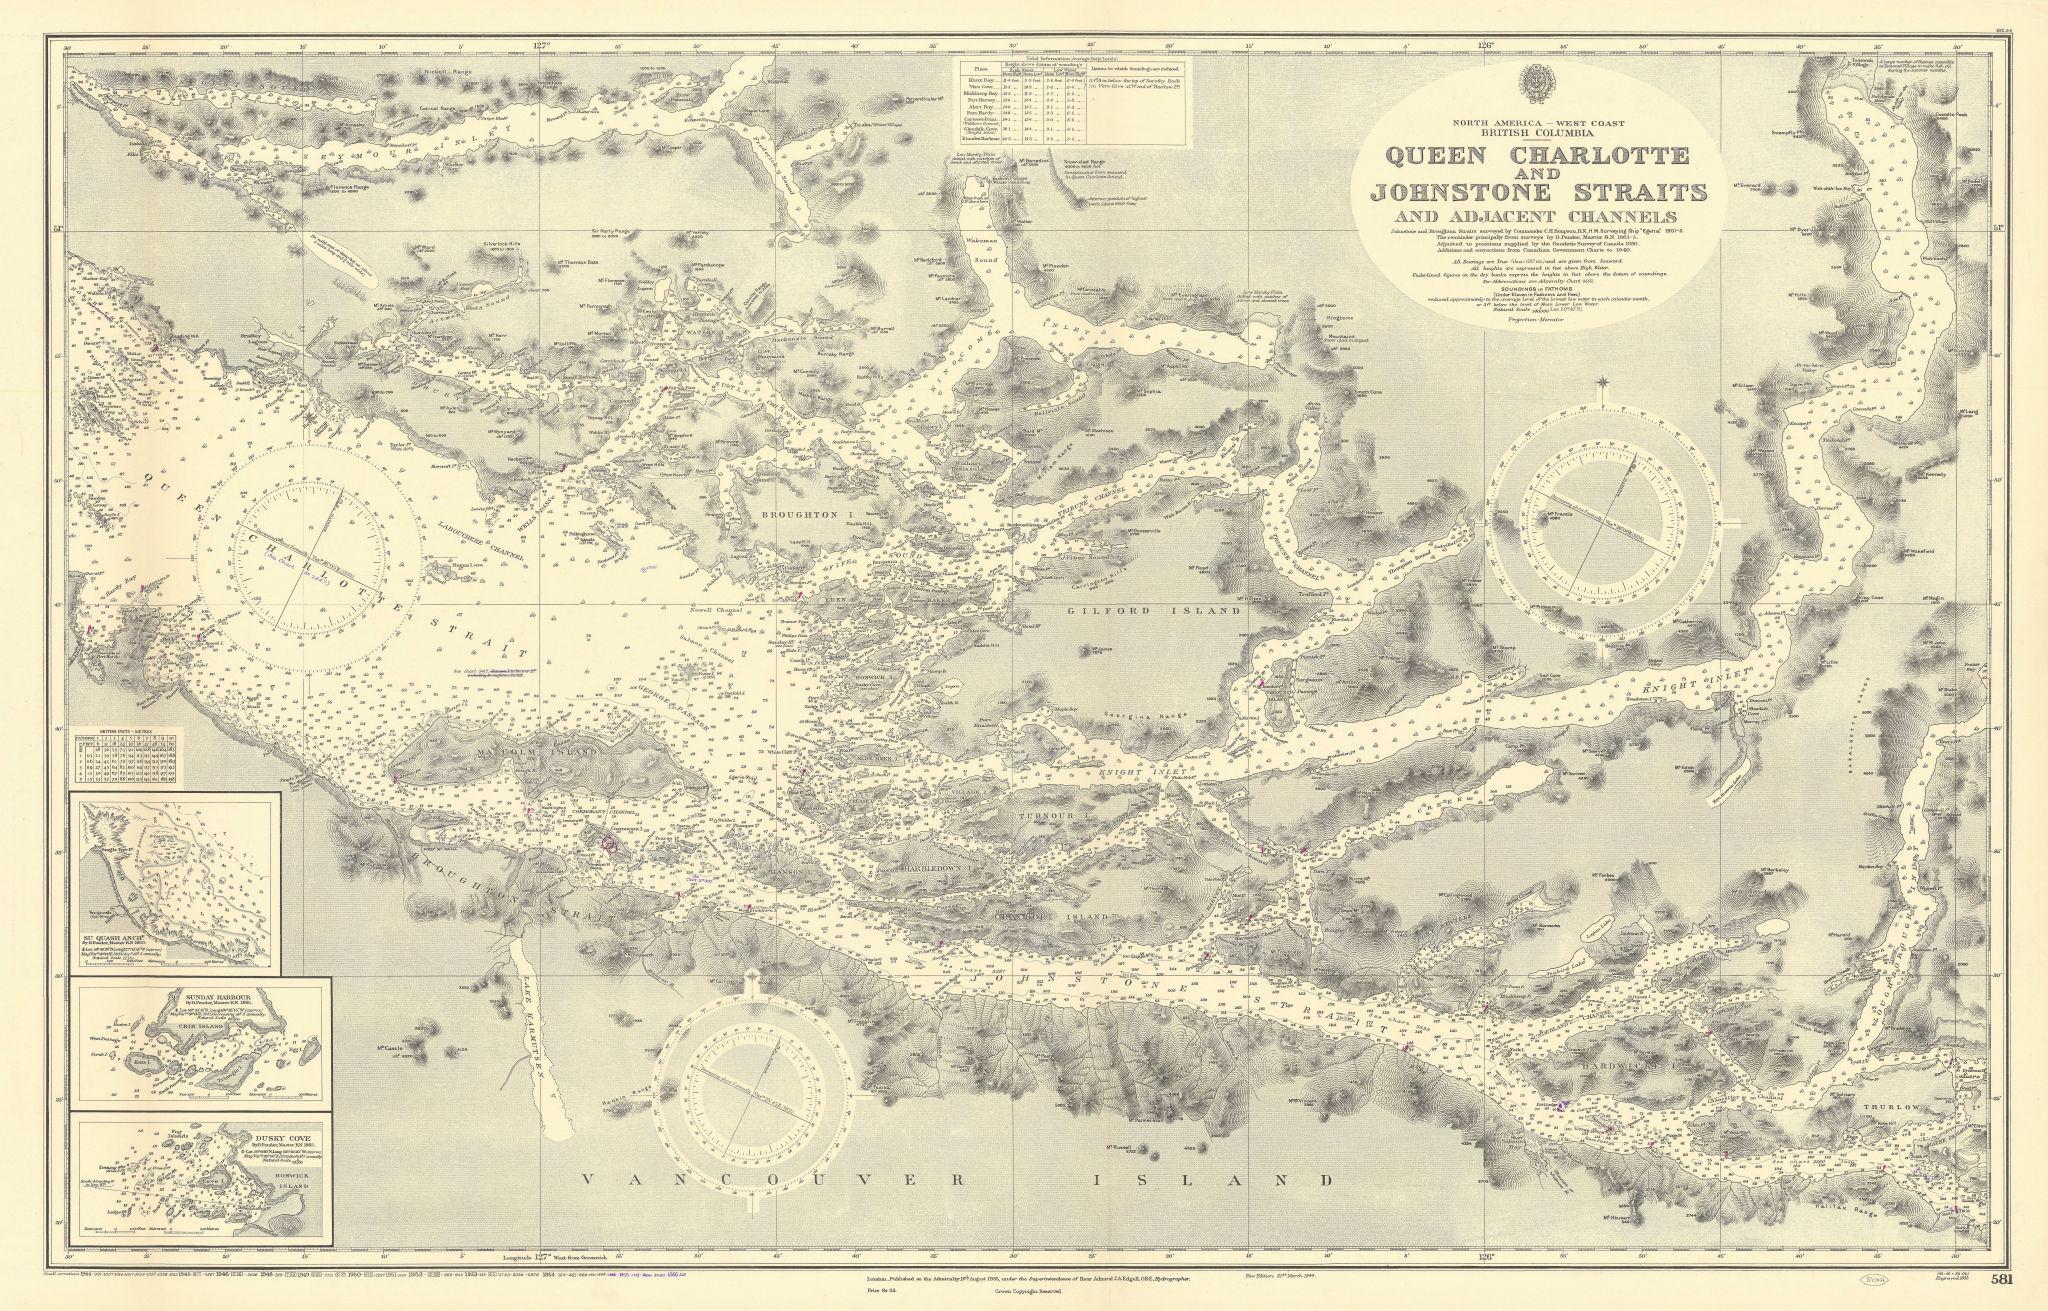 British Columbia Vancouver Isl. Johnstone Strait ADMIRALTY chart 1935 (1956) map